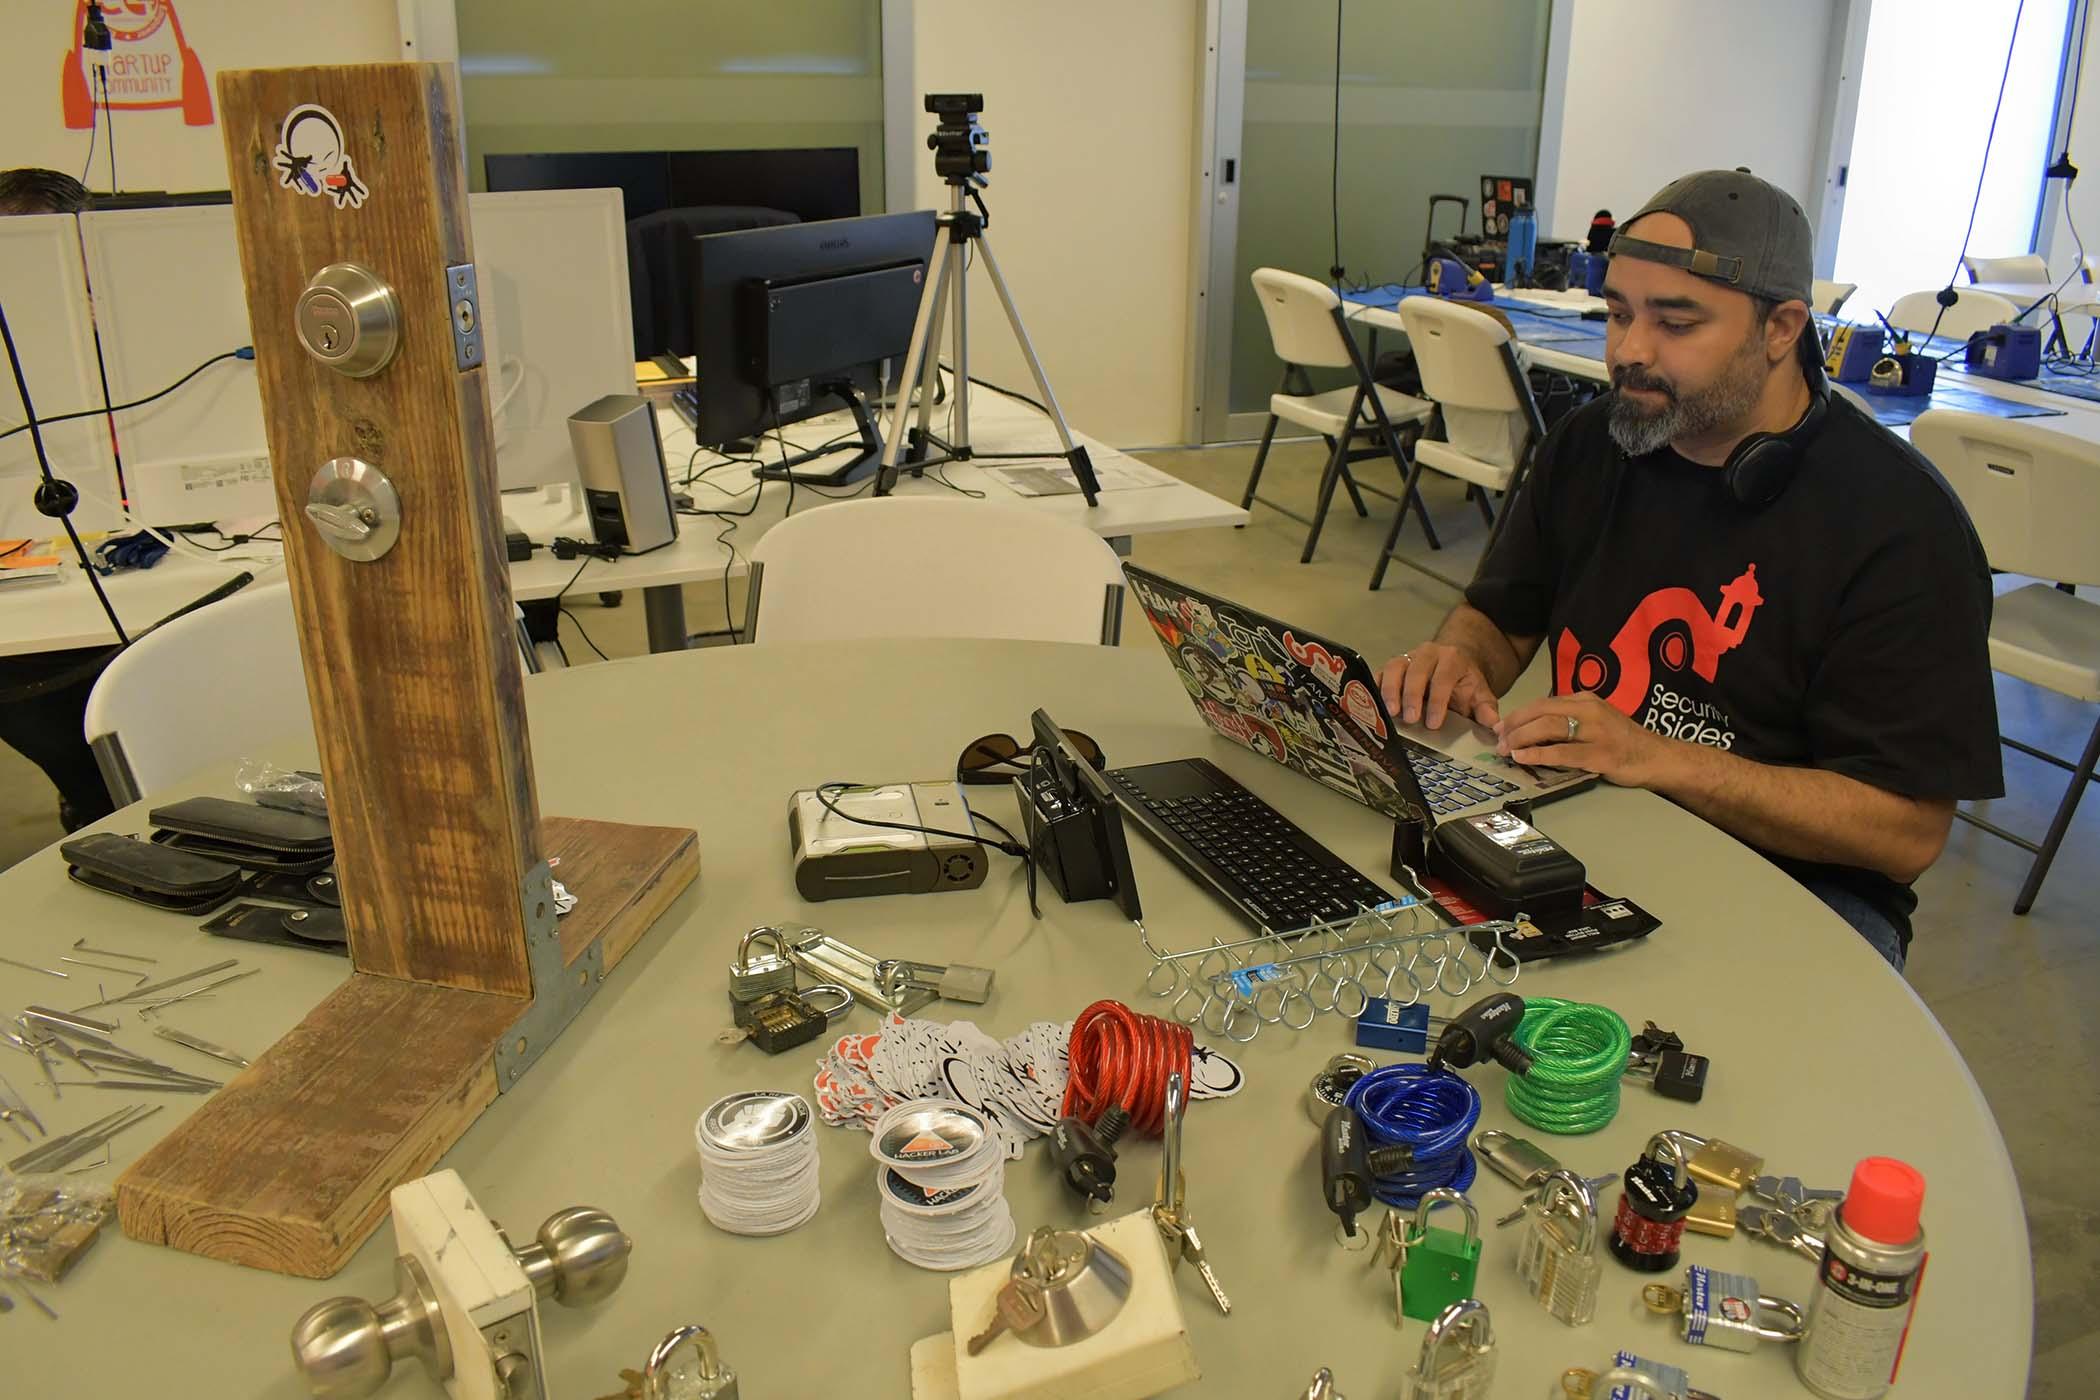 Hacker Lab 3.0